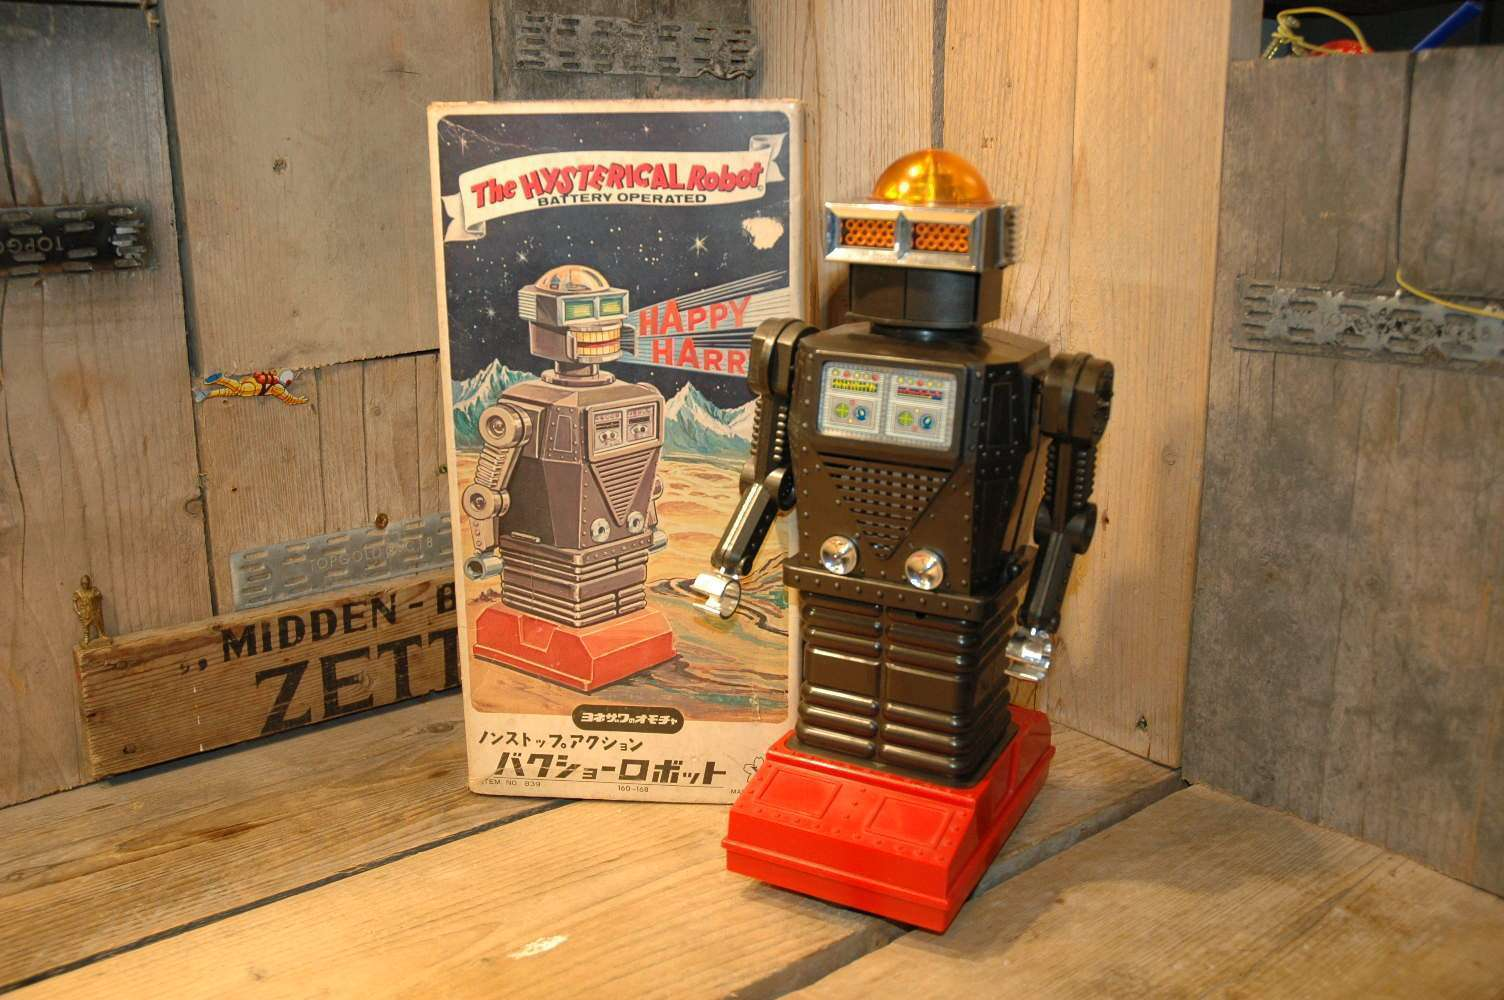 Waco / Yonezawa - The Hysterical Robot Happy Harry